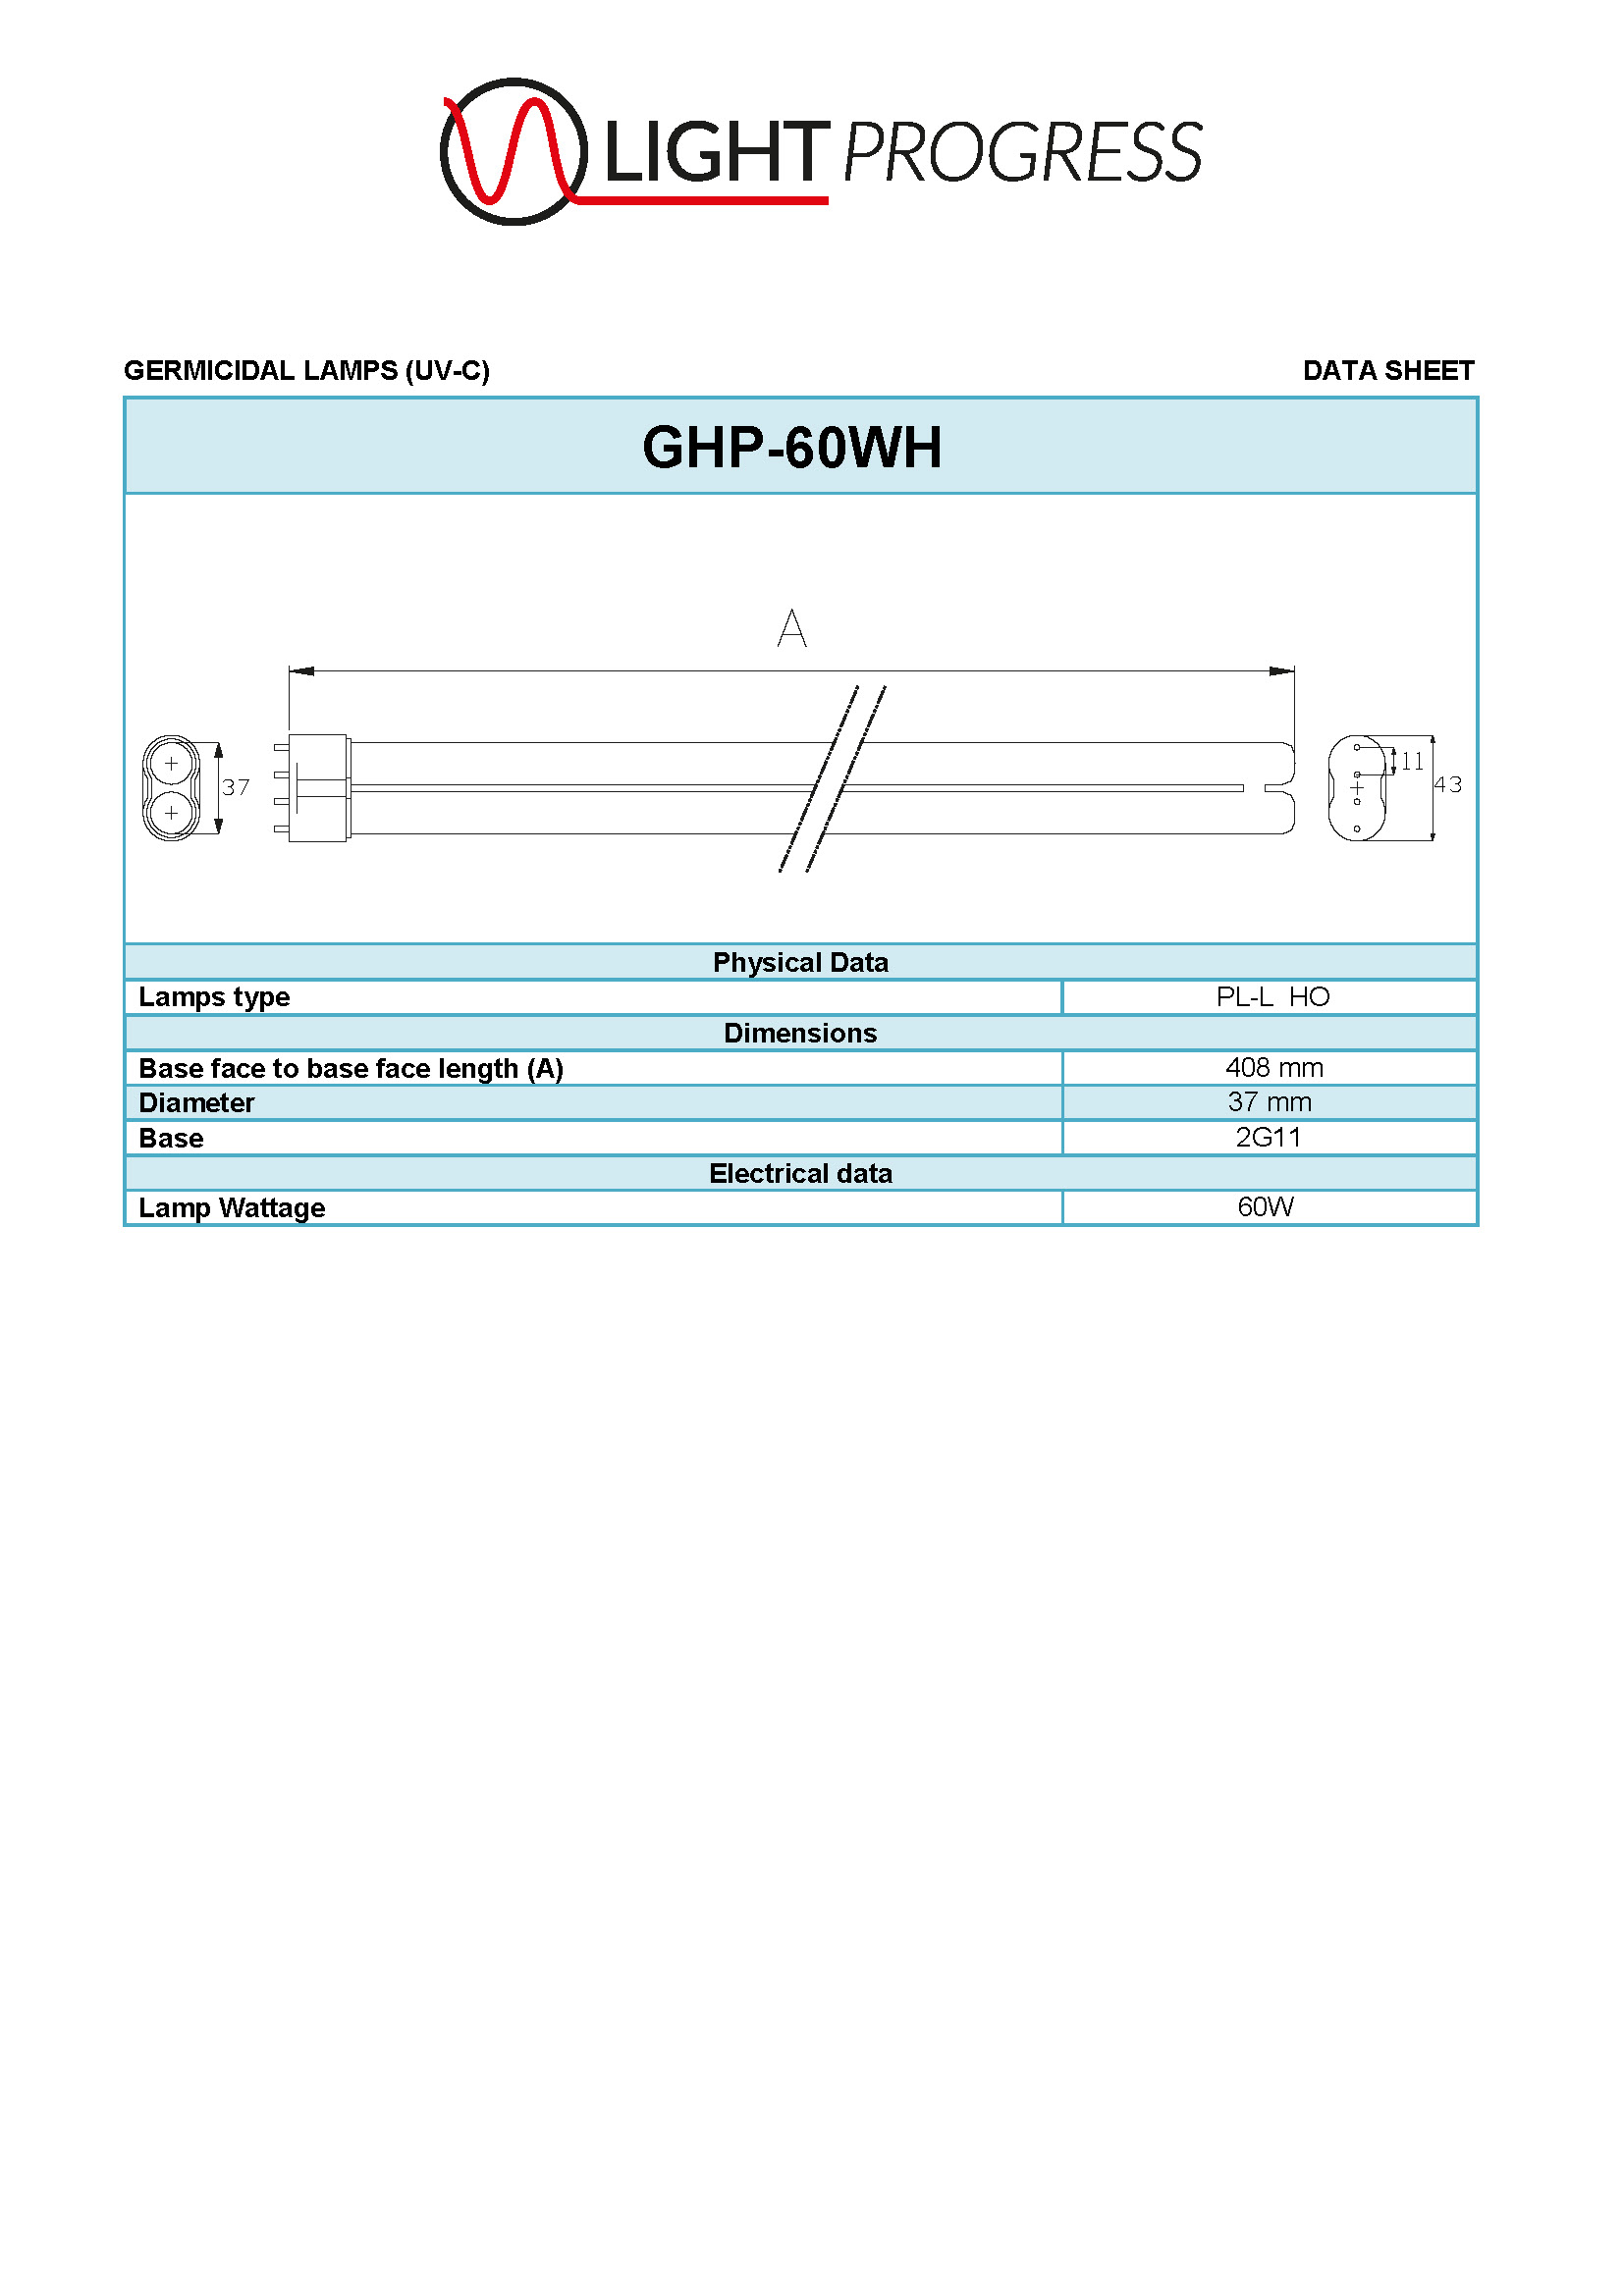 GHP-60WH LAMP (UVC)